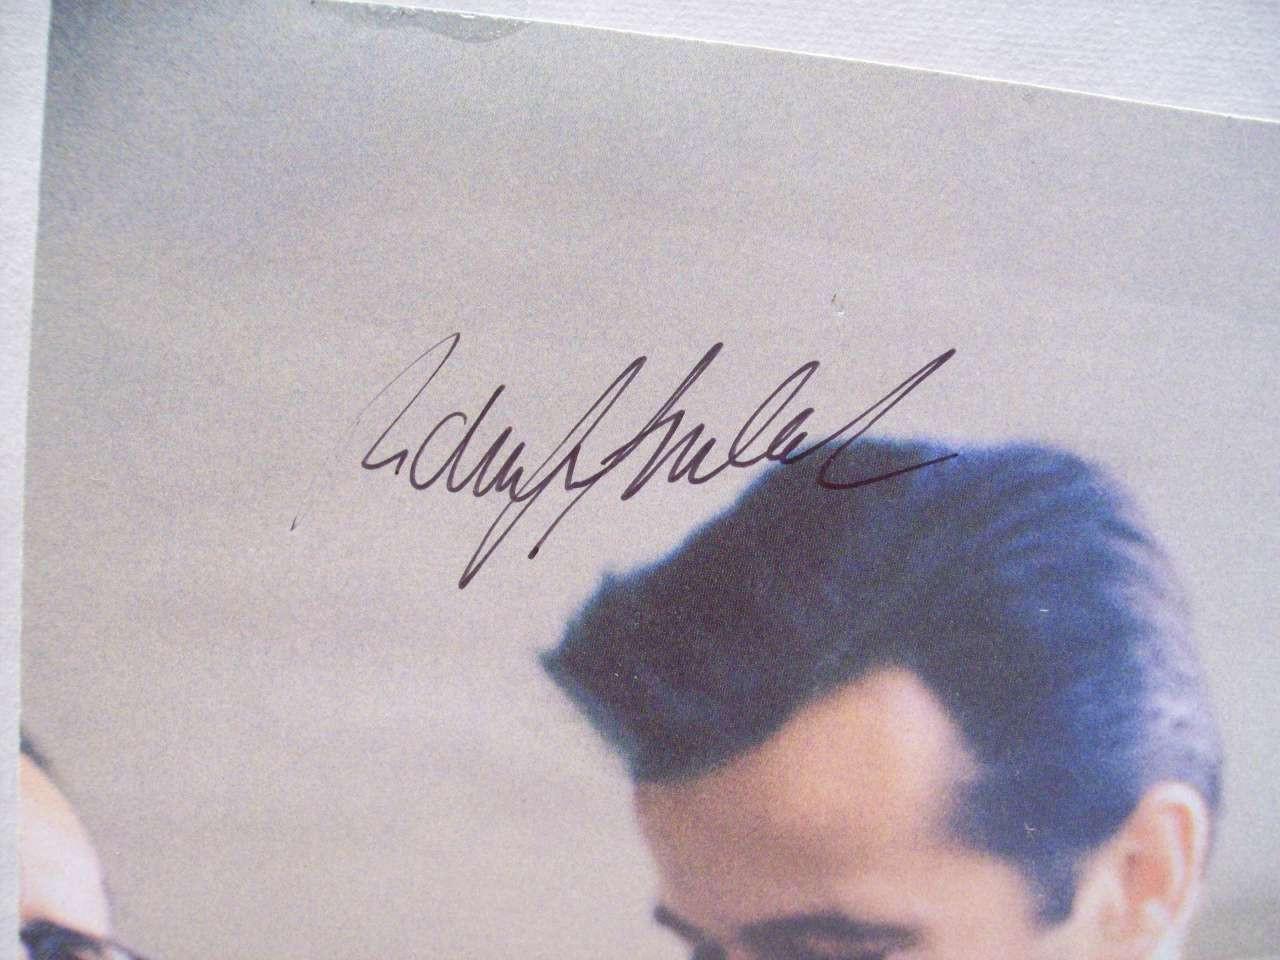 Goulet, Robert Photo Signed Autograph Atlantic City